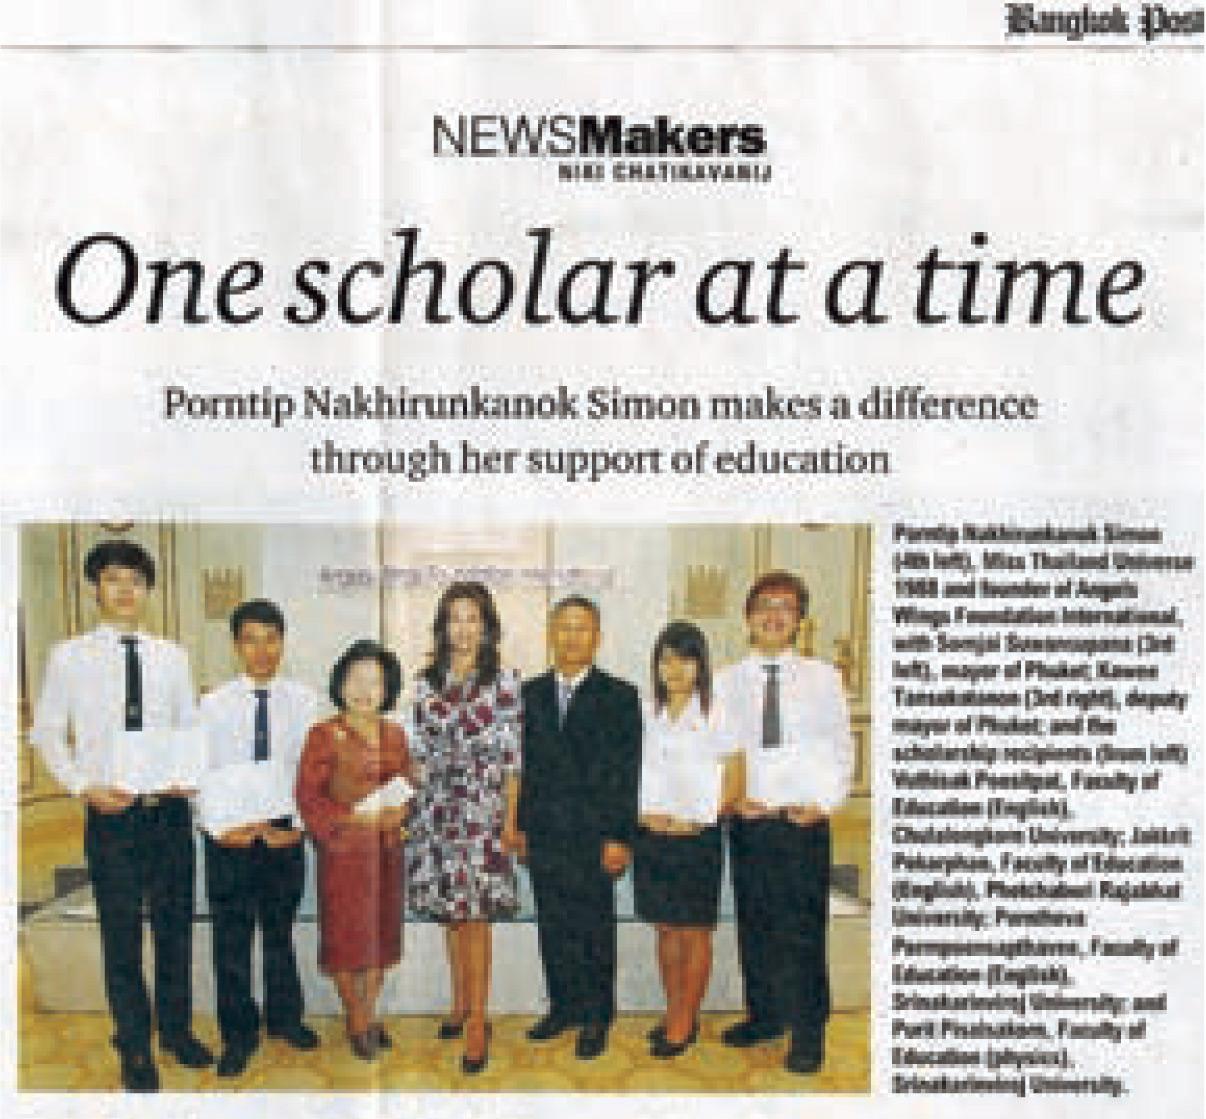 08/01/10 - Bangkok Post